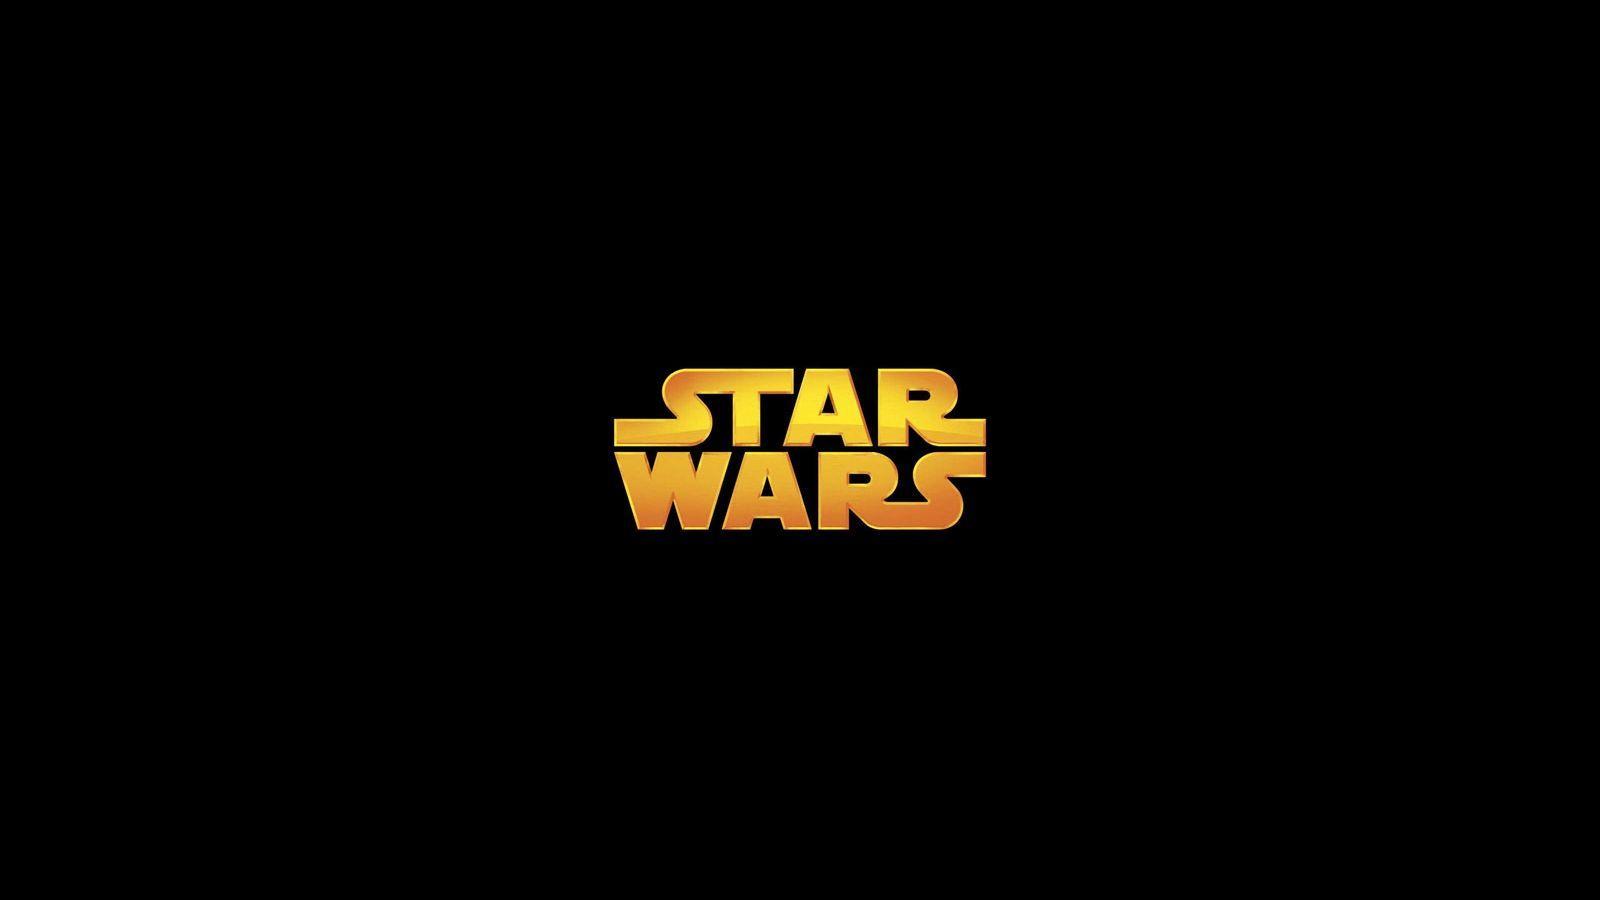 Star Wars Logo Wallpapers Top Free Star Wars Logo Backgrounds Wallpaperaccess